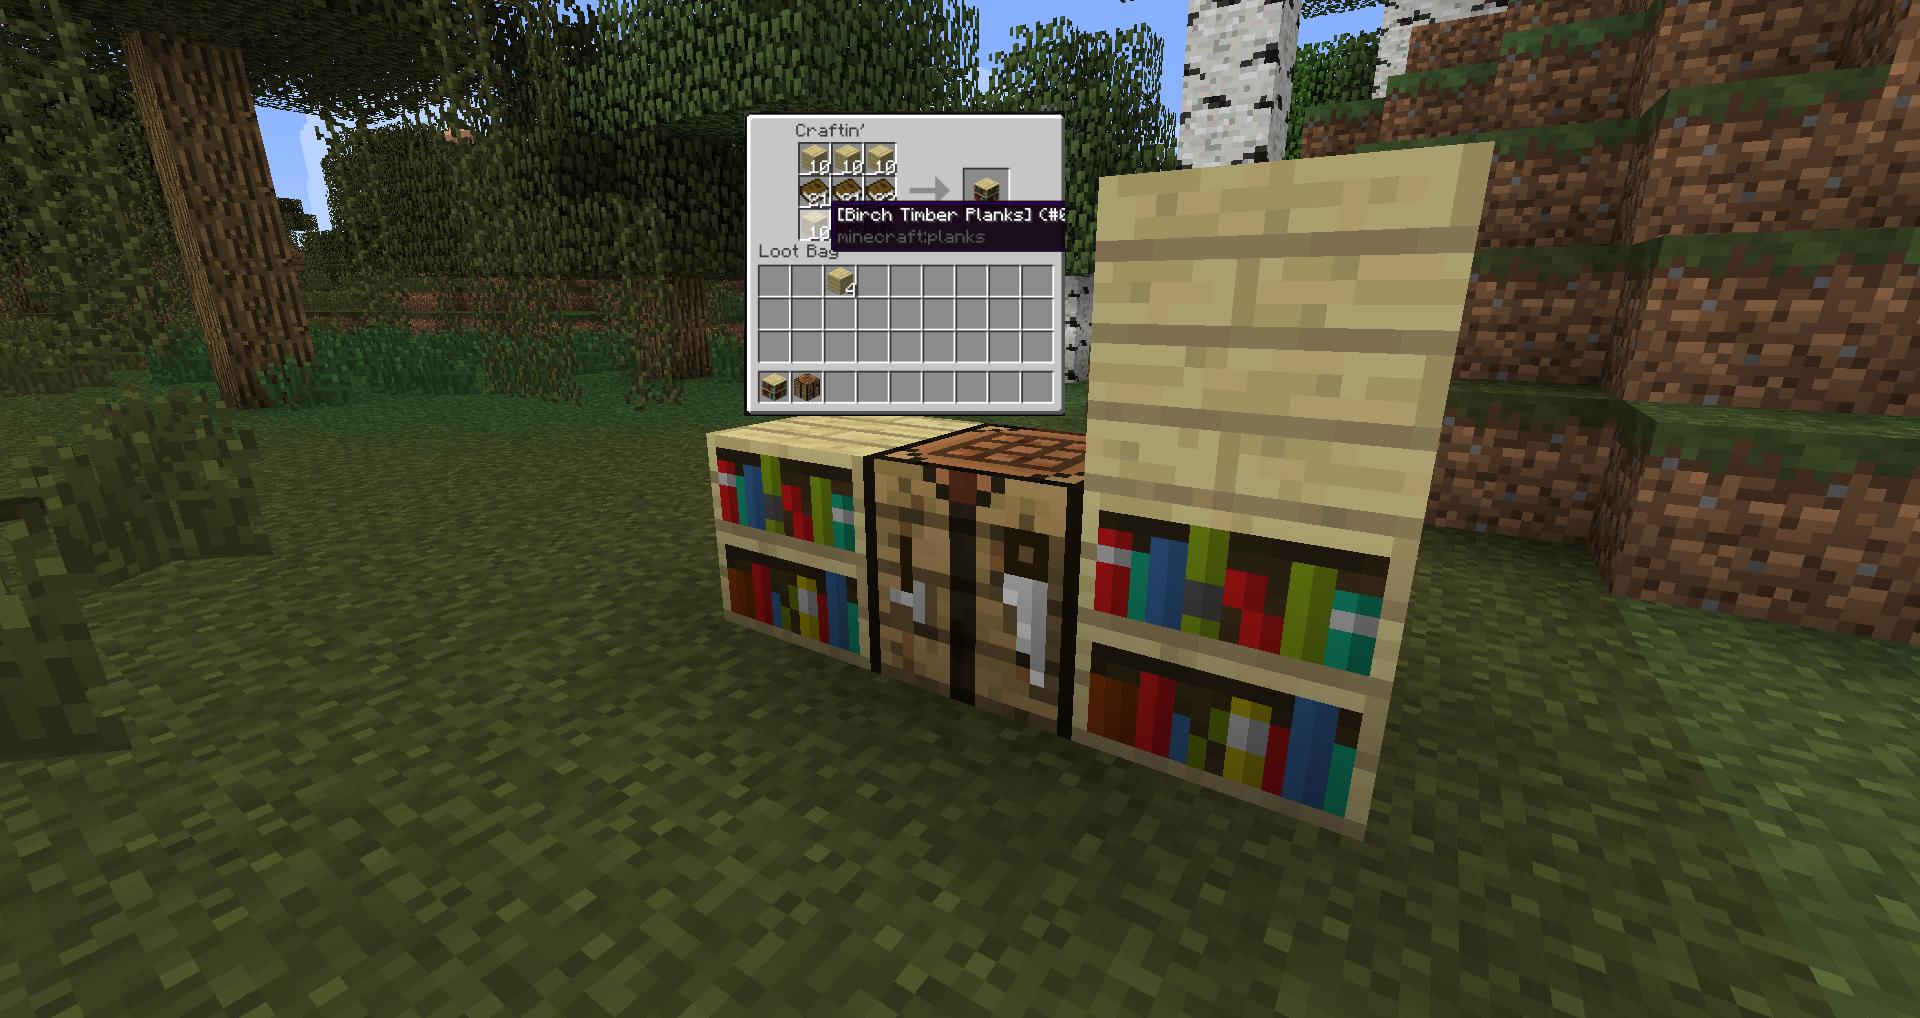 how to make a bookshelf in minecraft. Birch Bookshelf How To Make A In Minecraft I